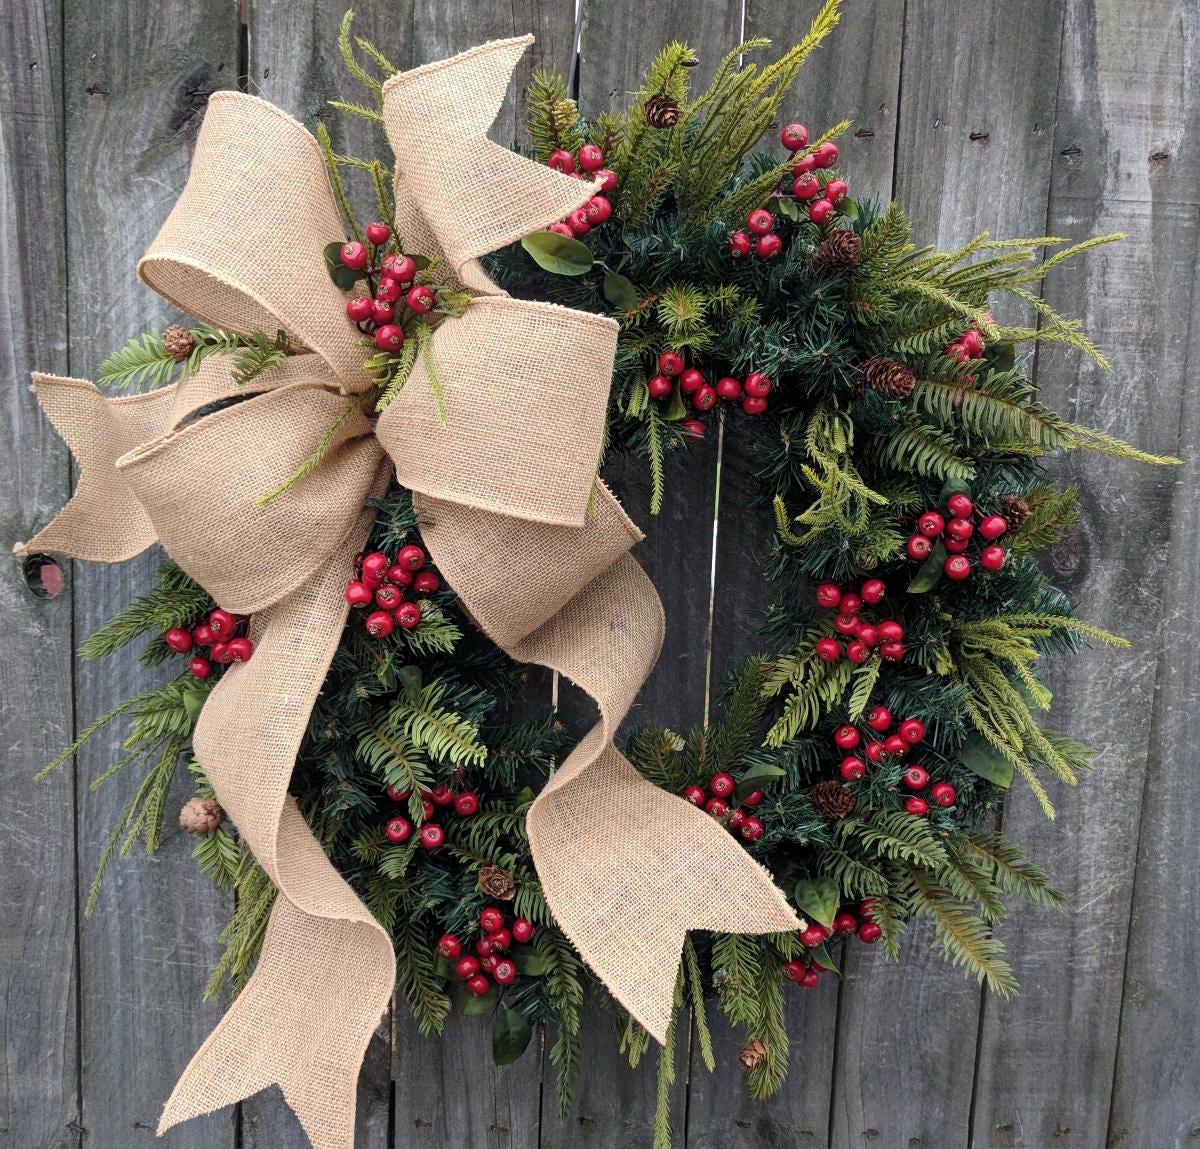 christmas wreath wreath burlap wreath burlap christmas and winter wreath woodland wreath natural christmas decor - Burlap Christmas Wreath